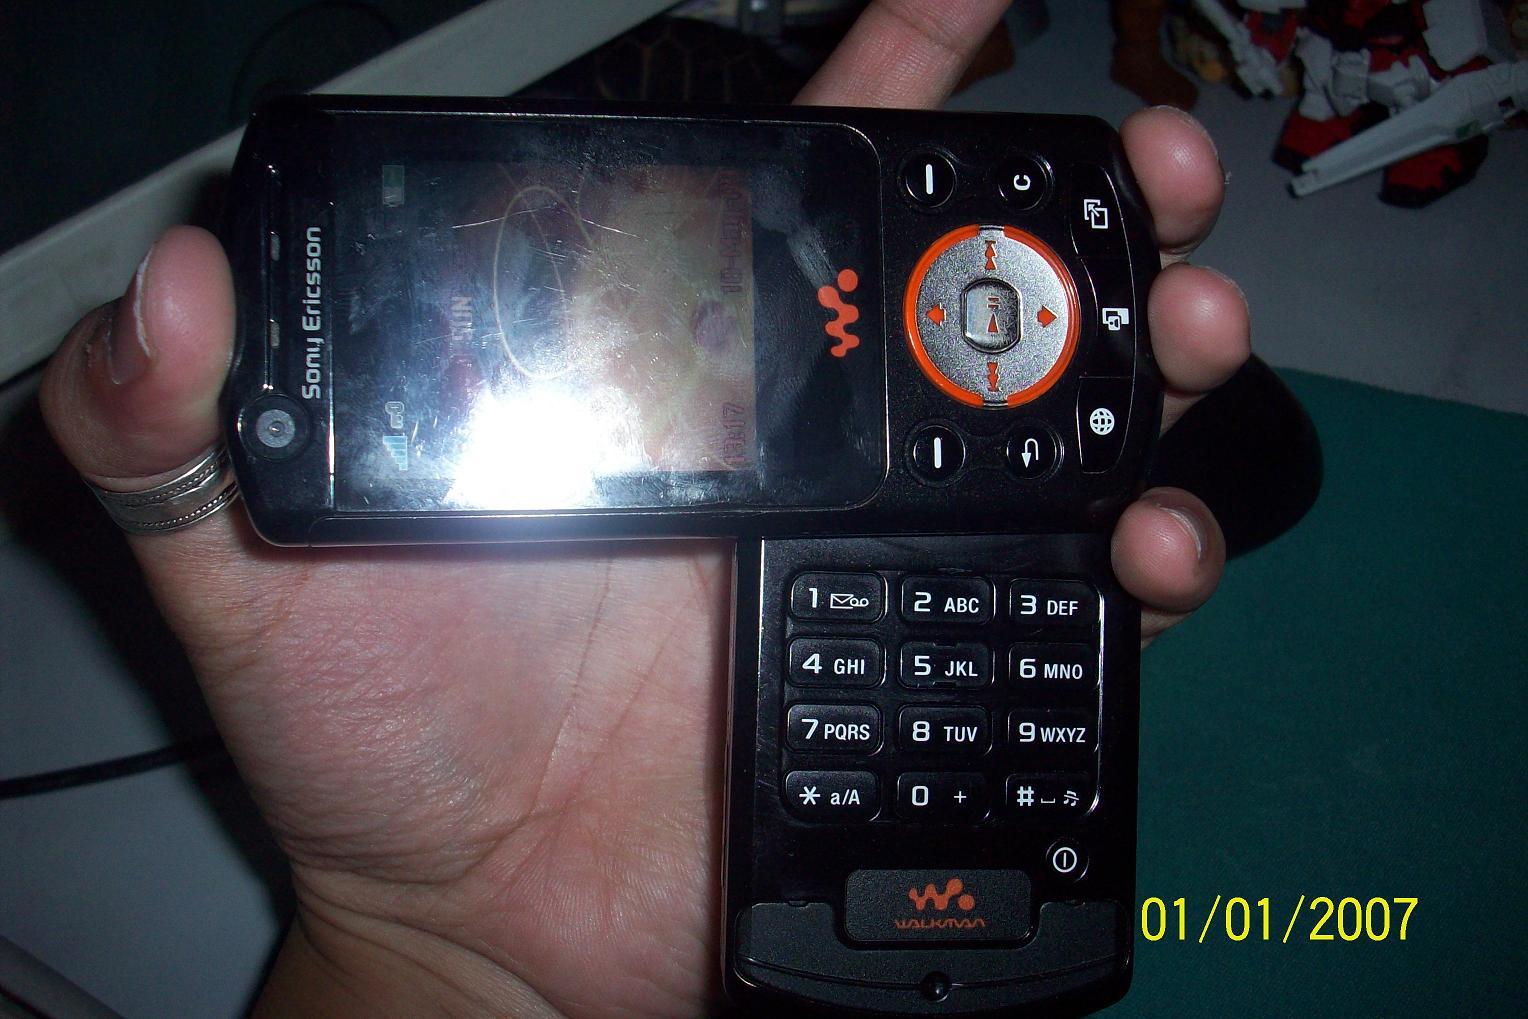 Ericsson W900